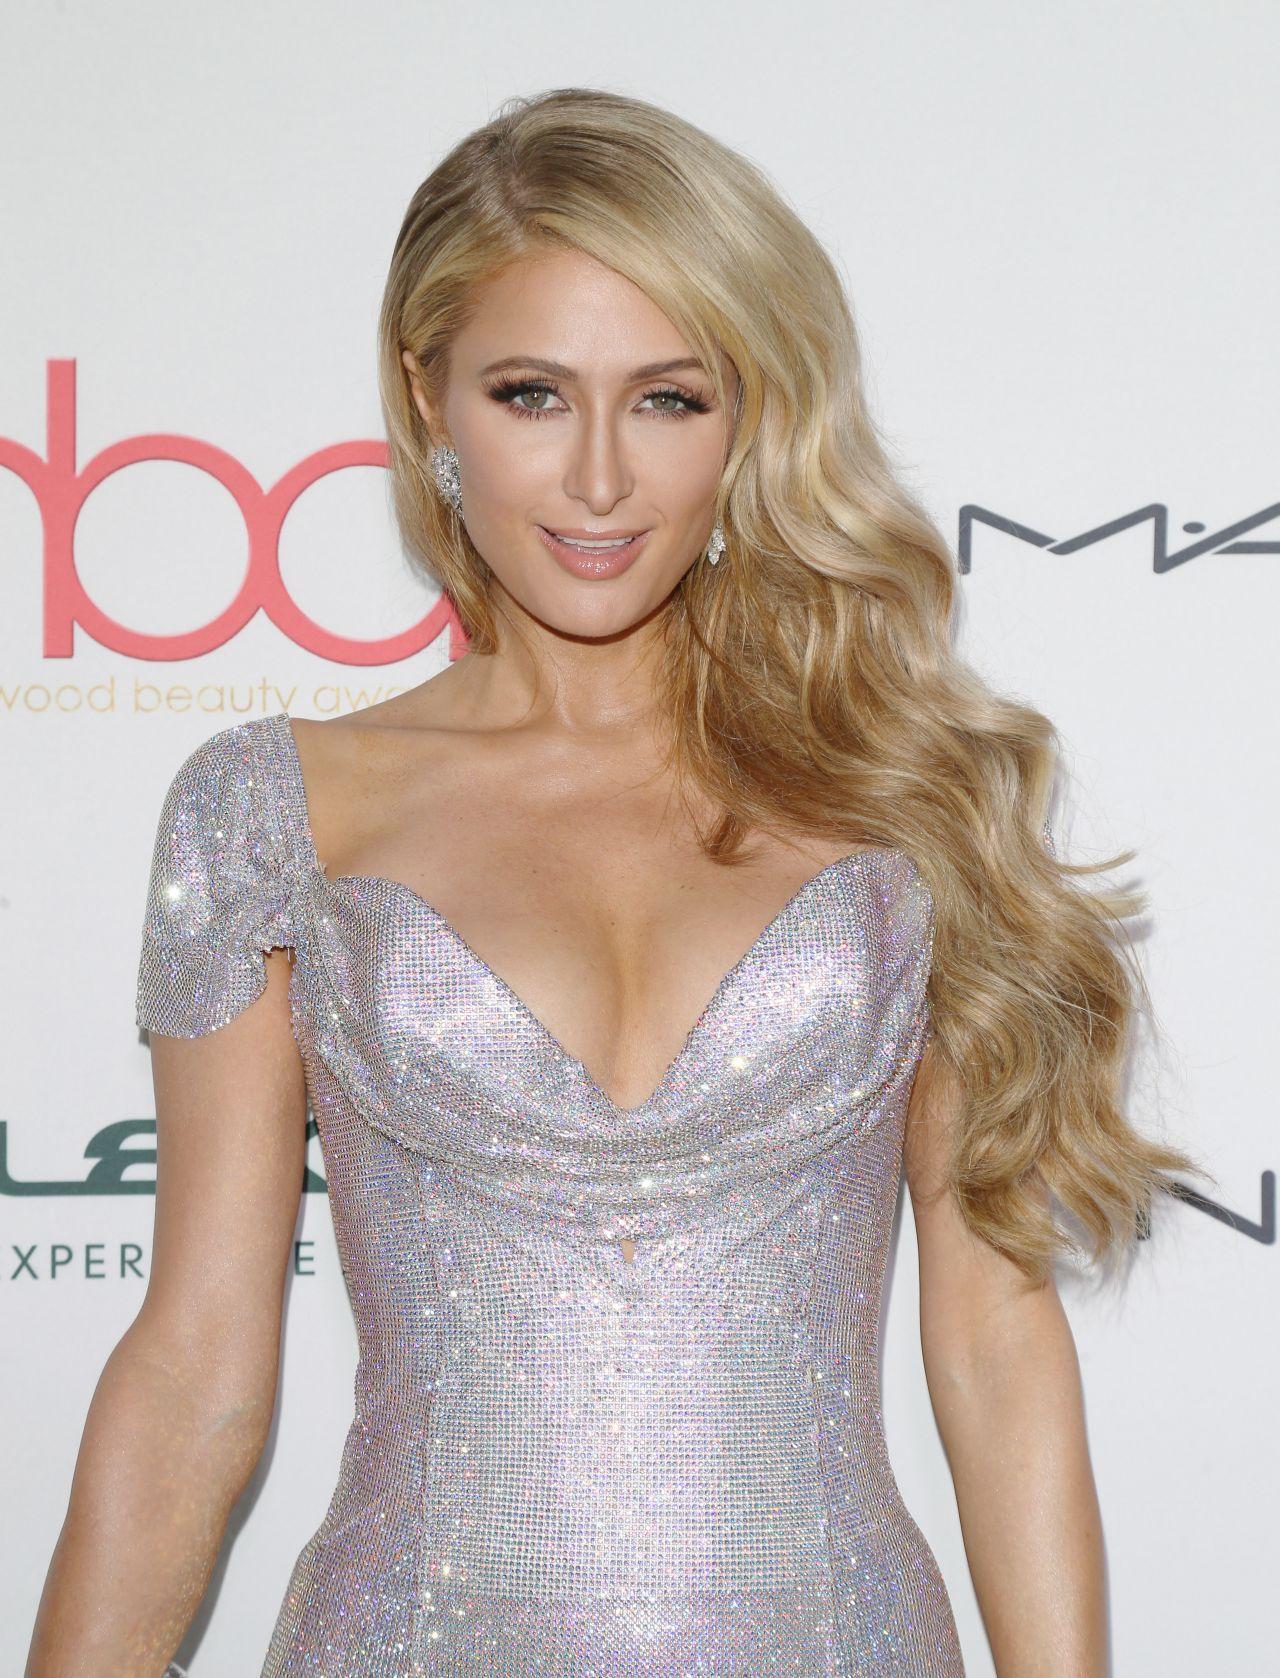 Paris Hilton - Hollywood Beauty Awards at Avalon in LA 2 ... Paris Hilton